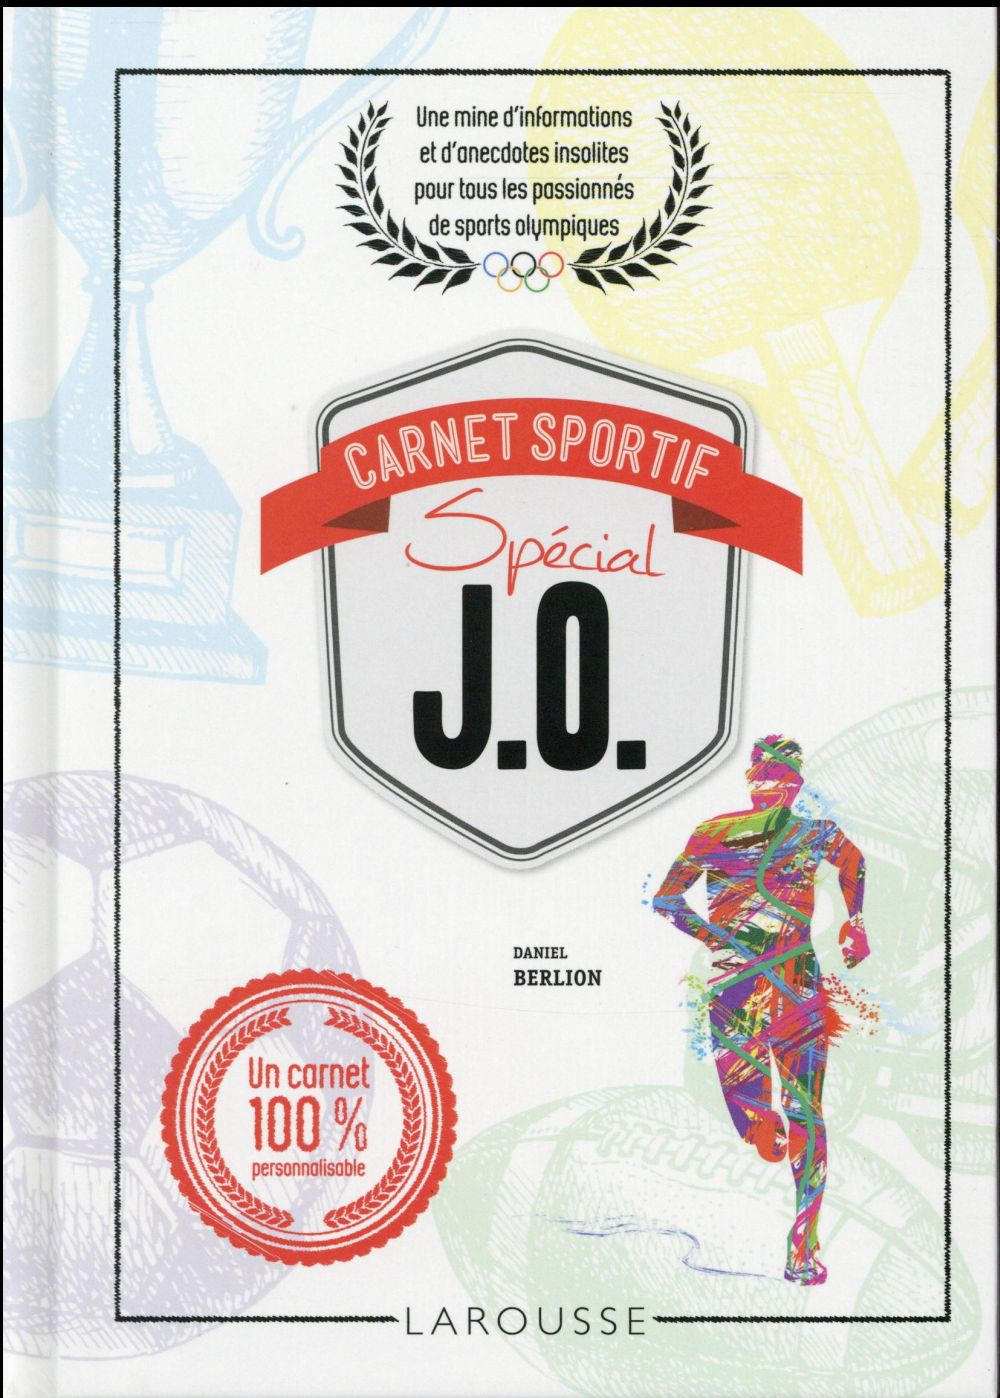 CARNET SPORTIF SPECIAL J.O.